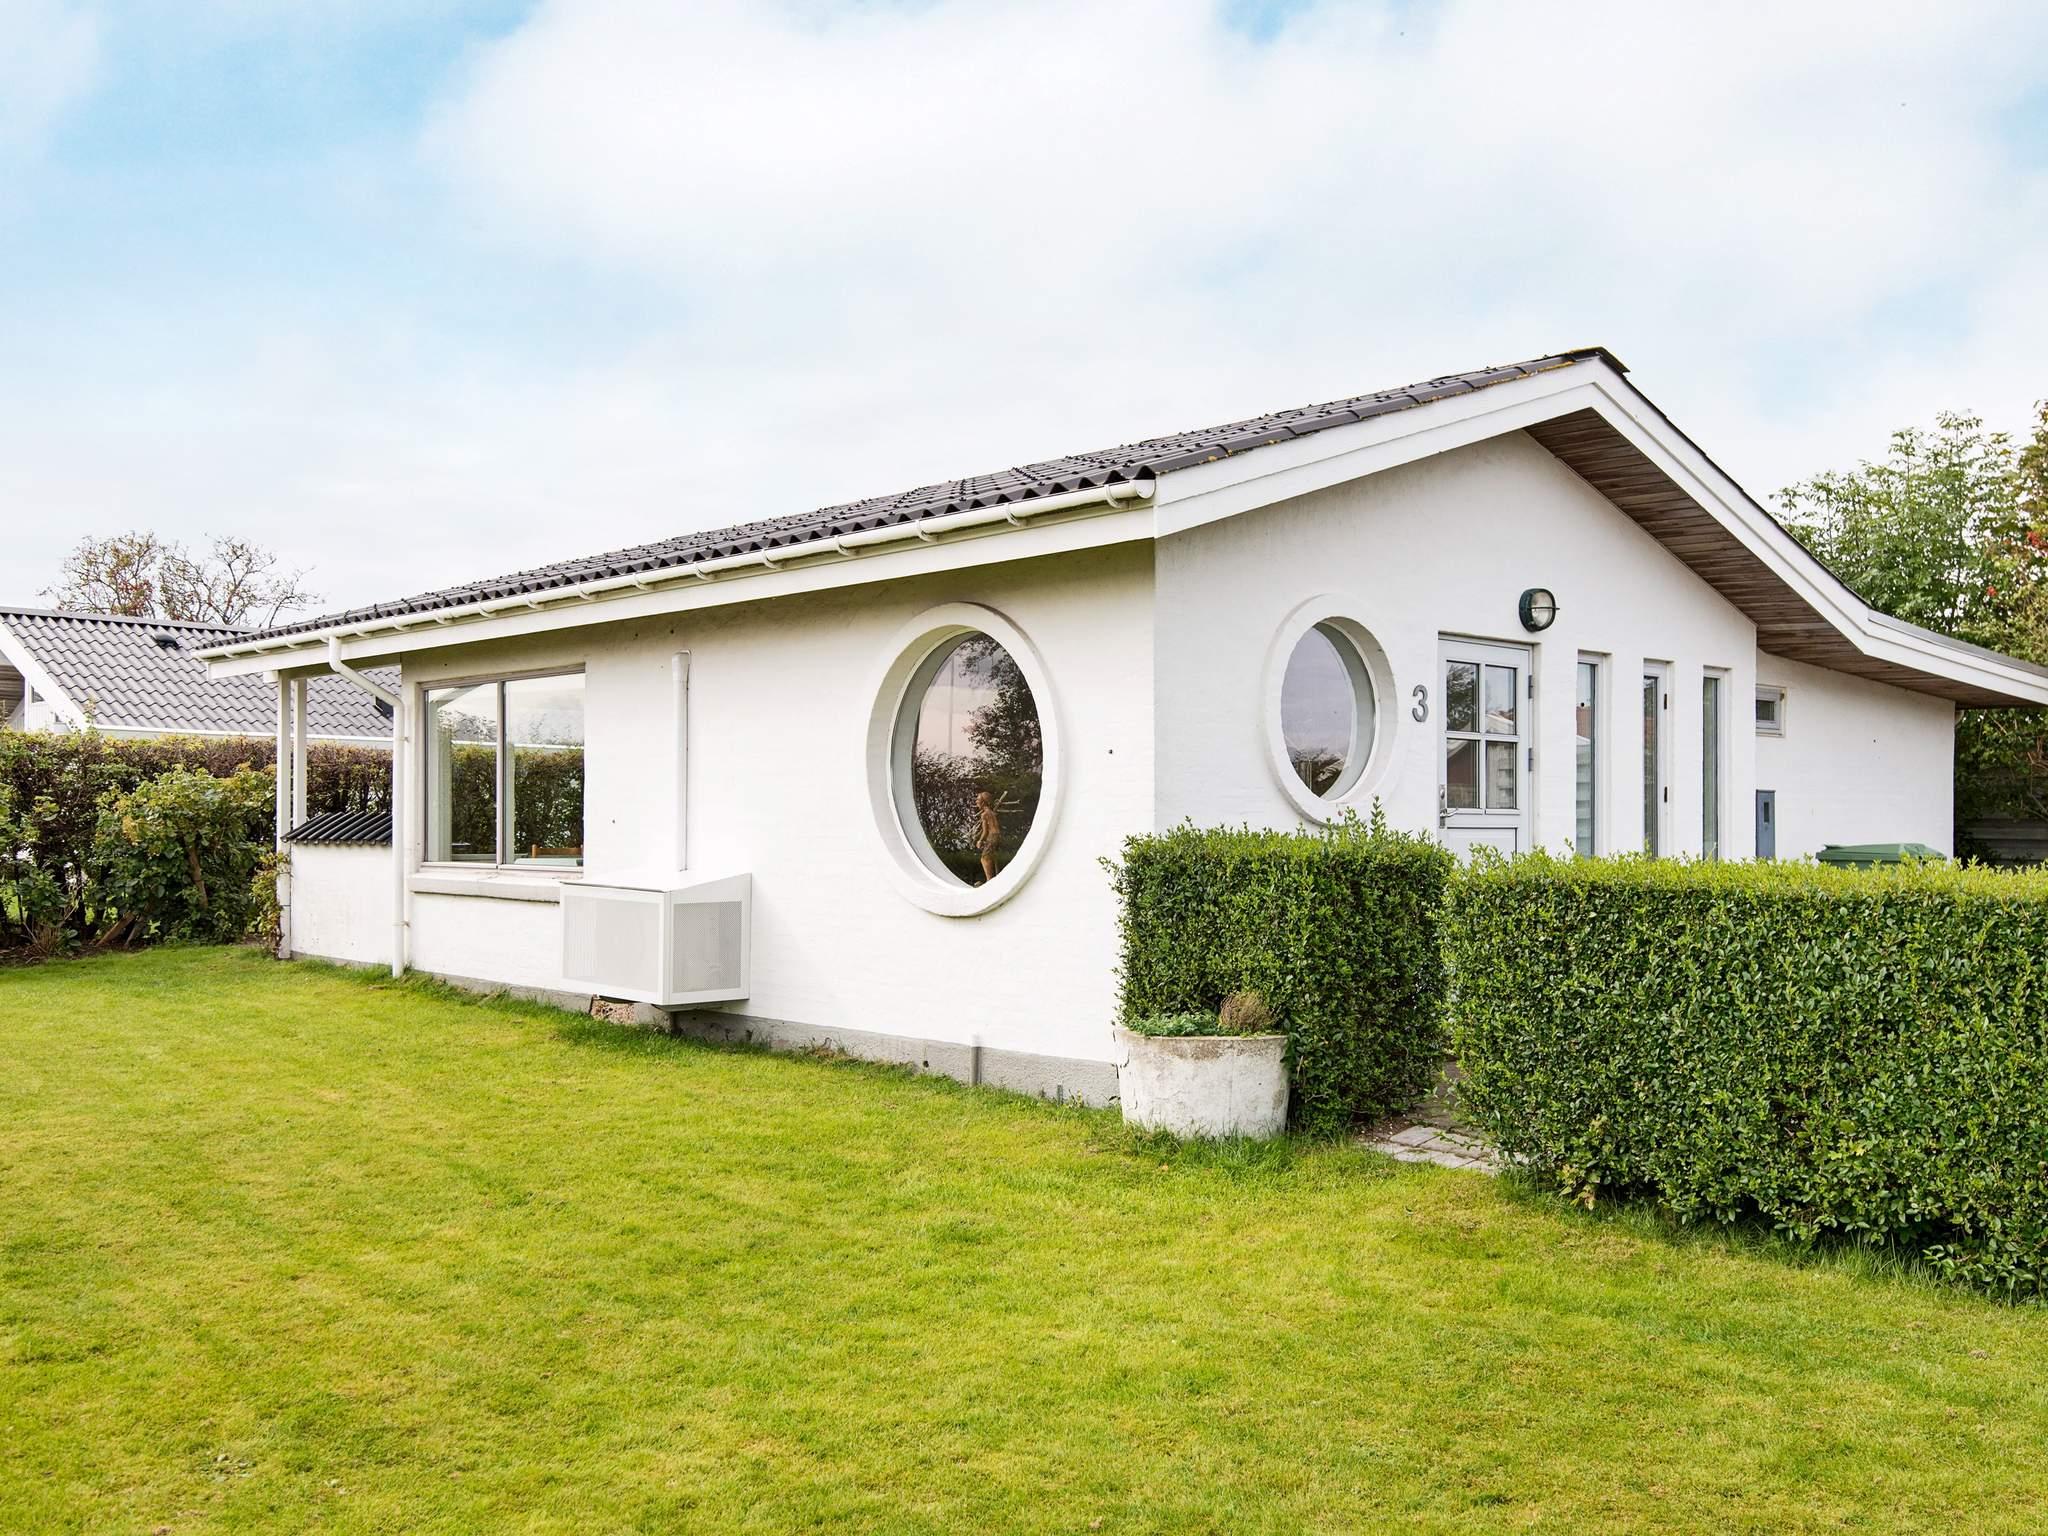 Ferienhaus Ajstrup Strand/Malling (2355032), Ajstrup, , Ostjütland, Dänemark, Bild 17